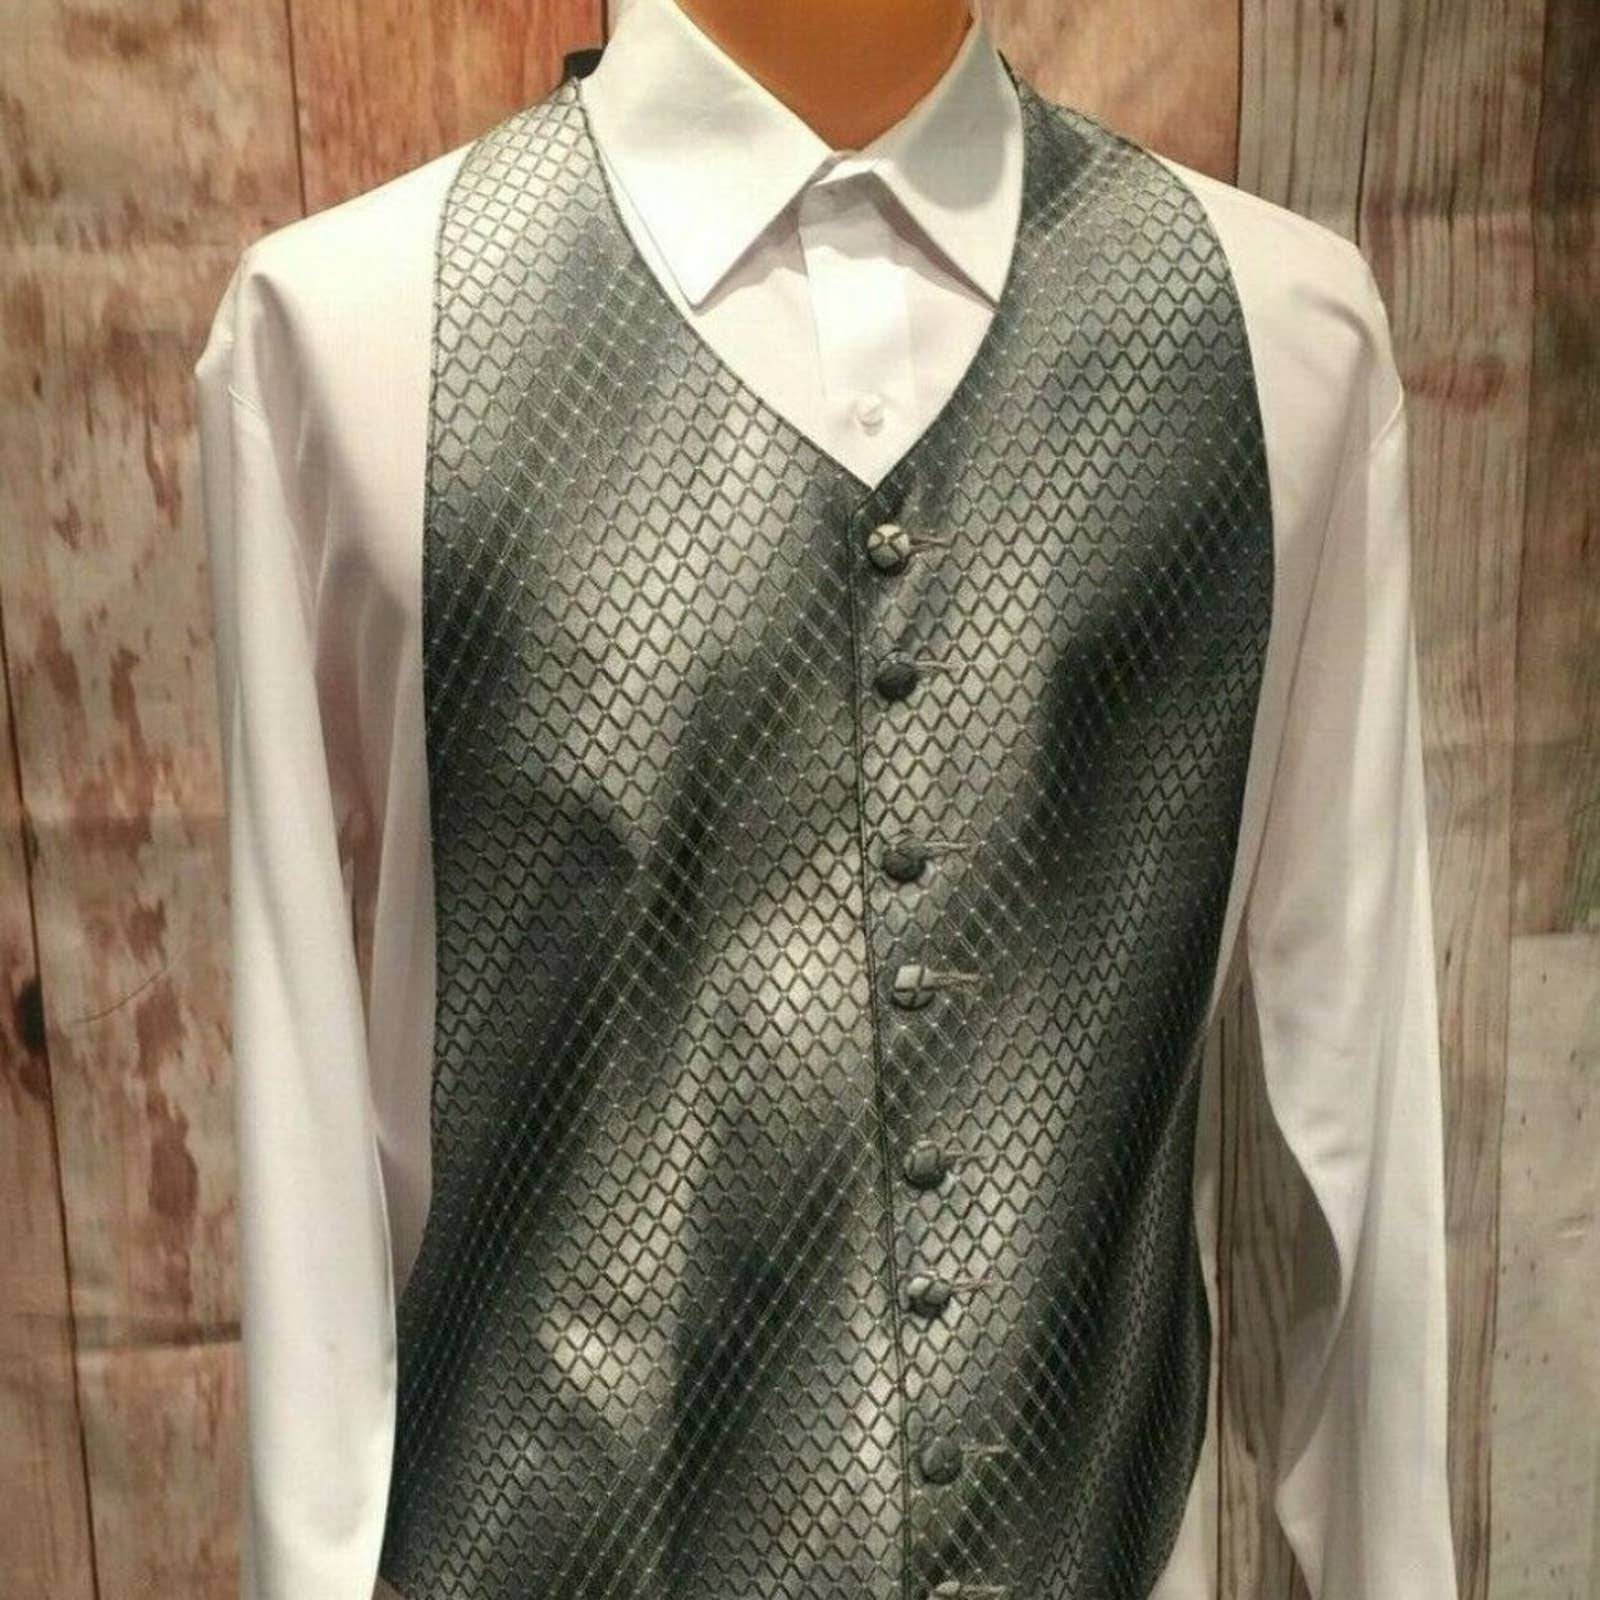 Silver Adjustable XL Tuxedo Vest